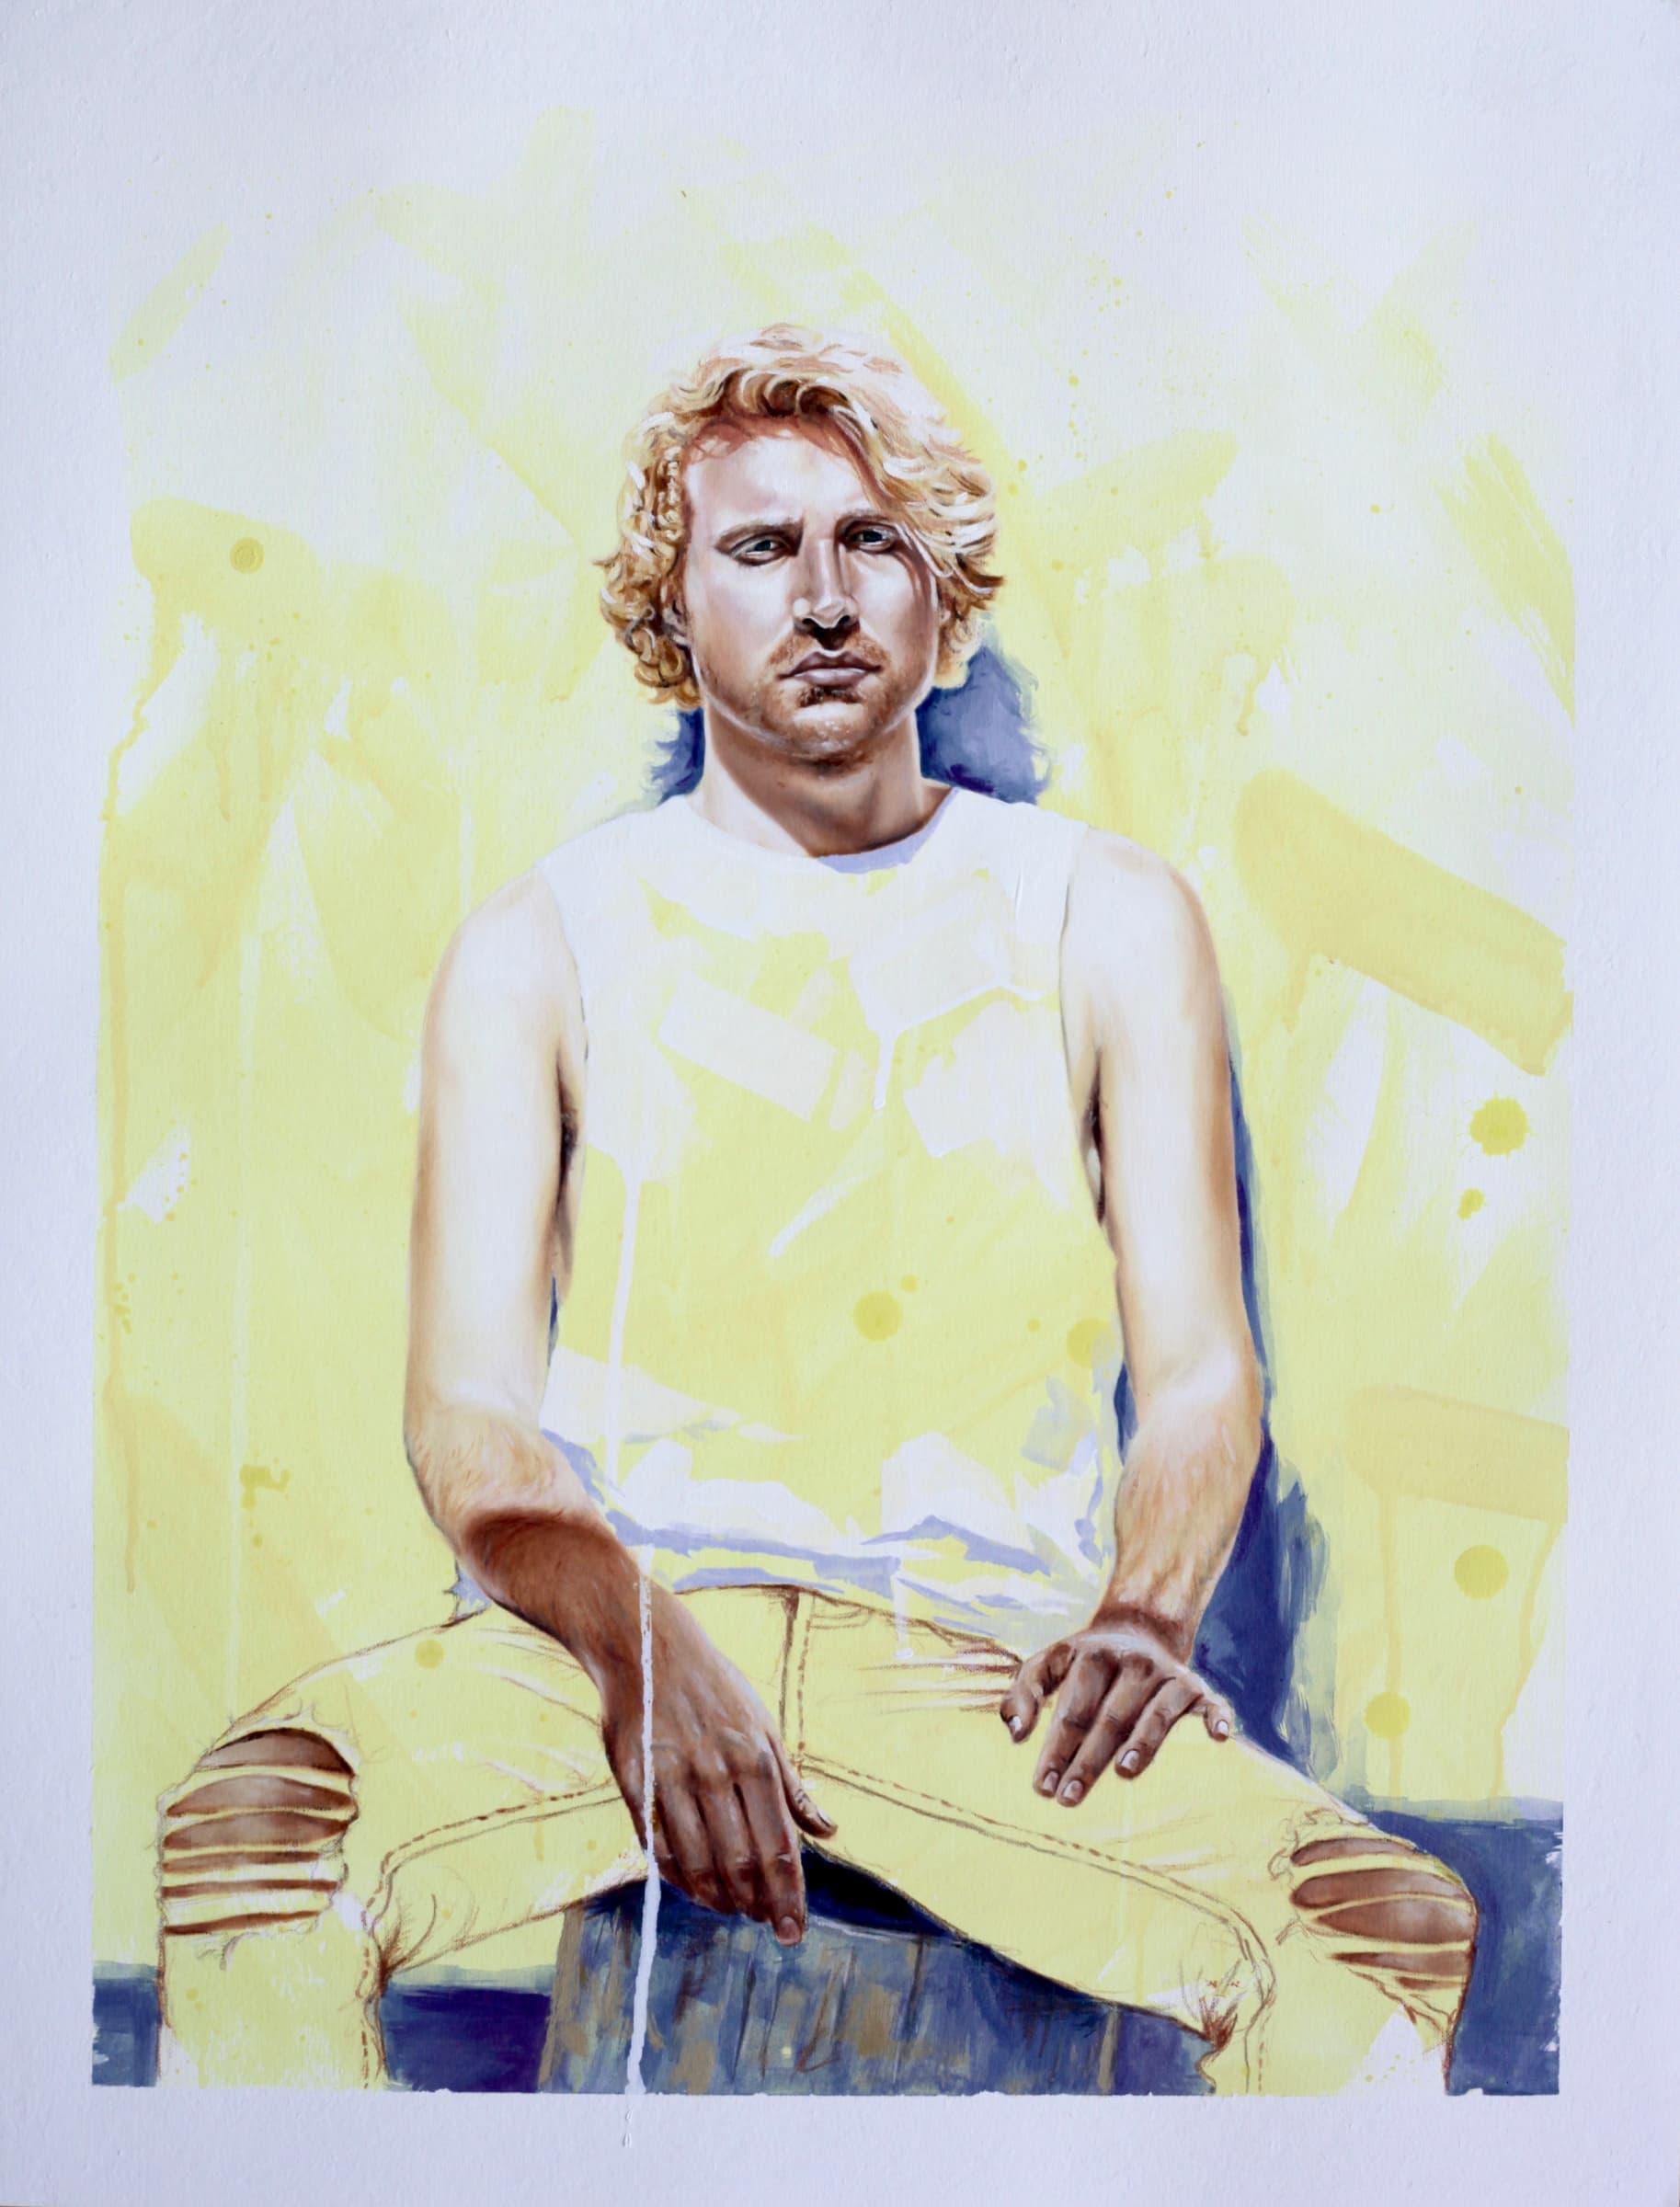 <span class=&#34;link fancybox-details-link&#34;><a href=&#34;/artworks/categories/120/3162-craig-cameron-mackintosh-wallflower-2016/&#34;>View Detail Page</a></span><div class=&#34;artist&#34;><strong>Craig Cameron-Mackintosh</strong></div> <div class=&#34;title&#34;><em>Wallflower</em>, 2016</div> <div class=&#34;medium&#34;>Oil On Paper</div> <div class=&#34;dimensions&#34;>68cm x 53cm</div><div class=&#34;price&#34;>R7,800.00</div>